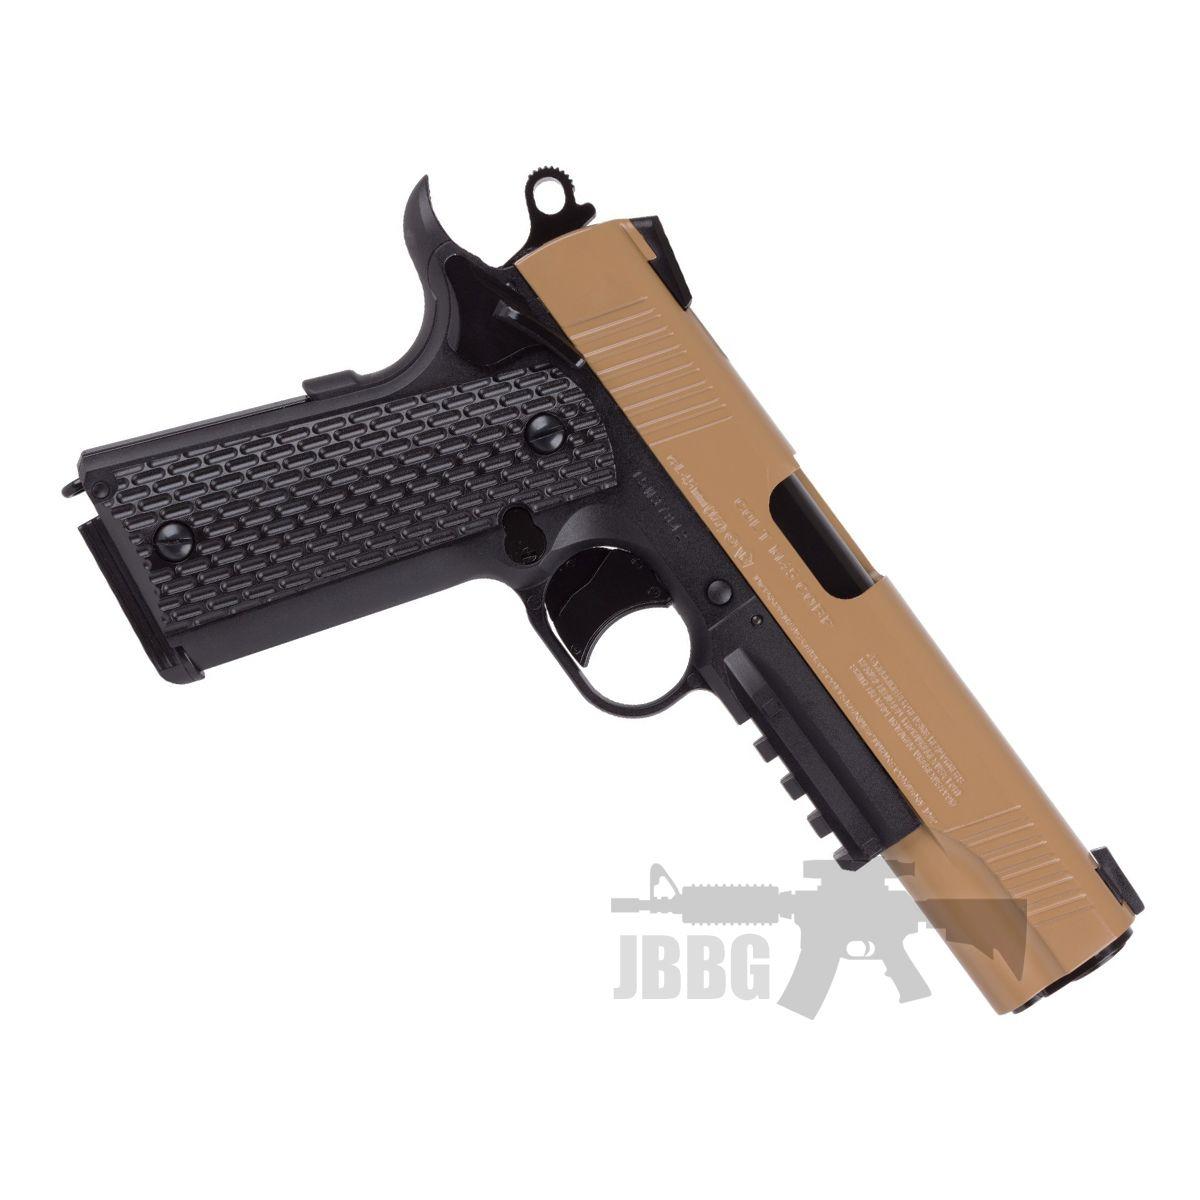 Colt M45 Cqbp Metal Slide Air Pistol .177 Bb Tan